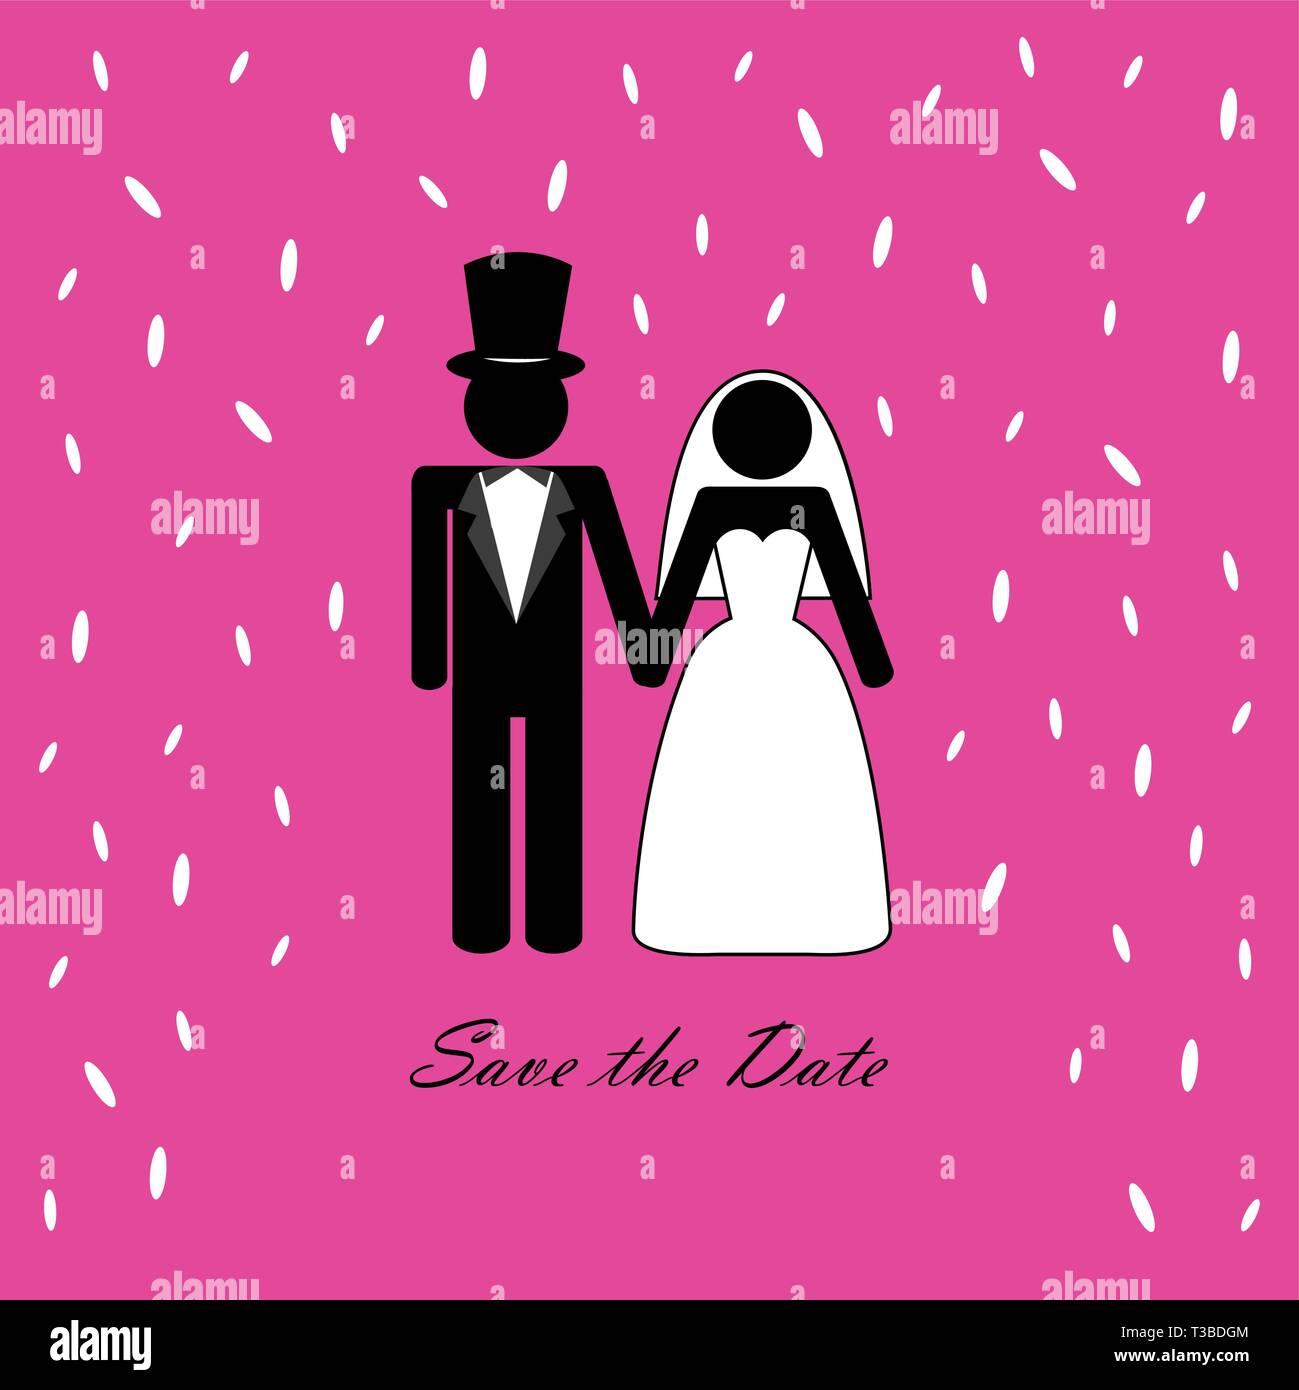 Dating Balz-Verlobung und Ehe Dating-Seiten kent uk